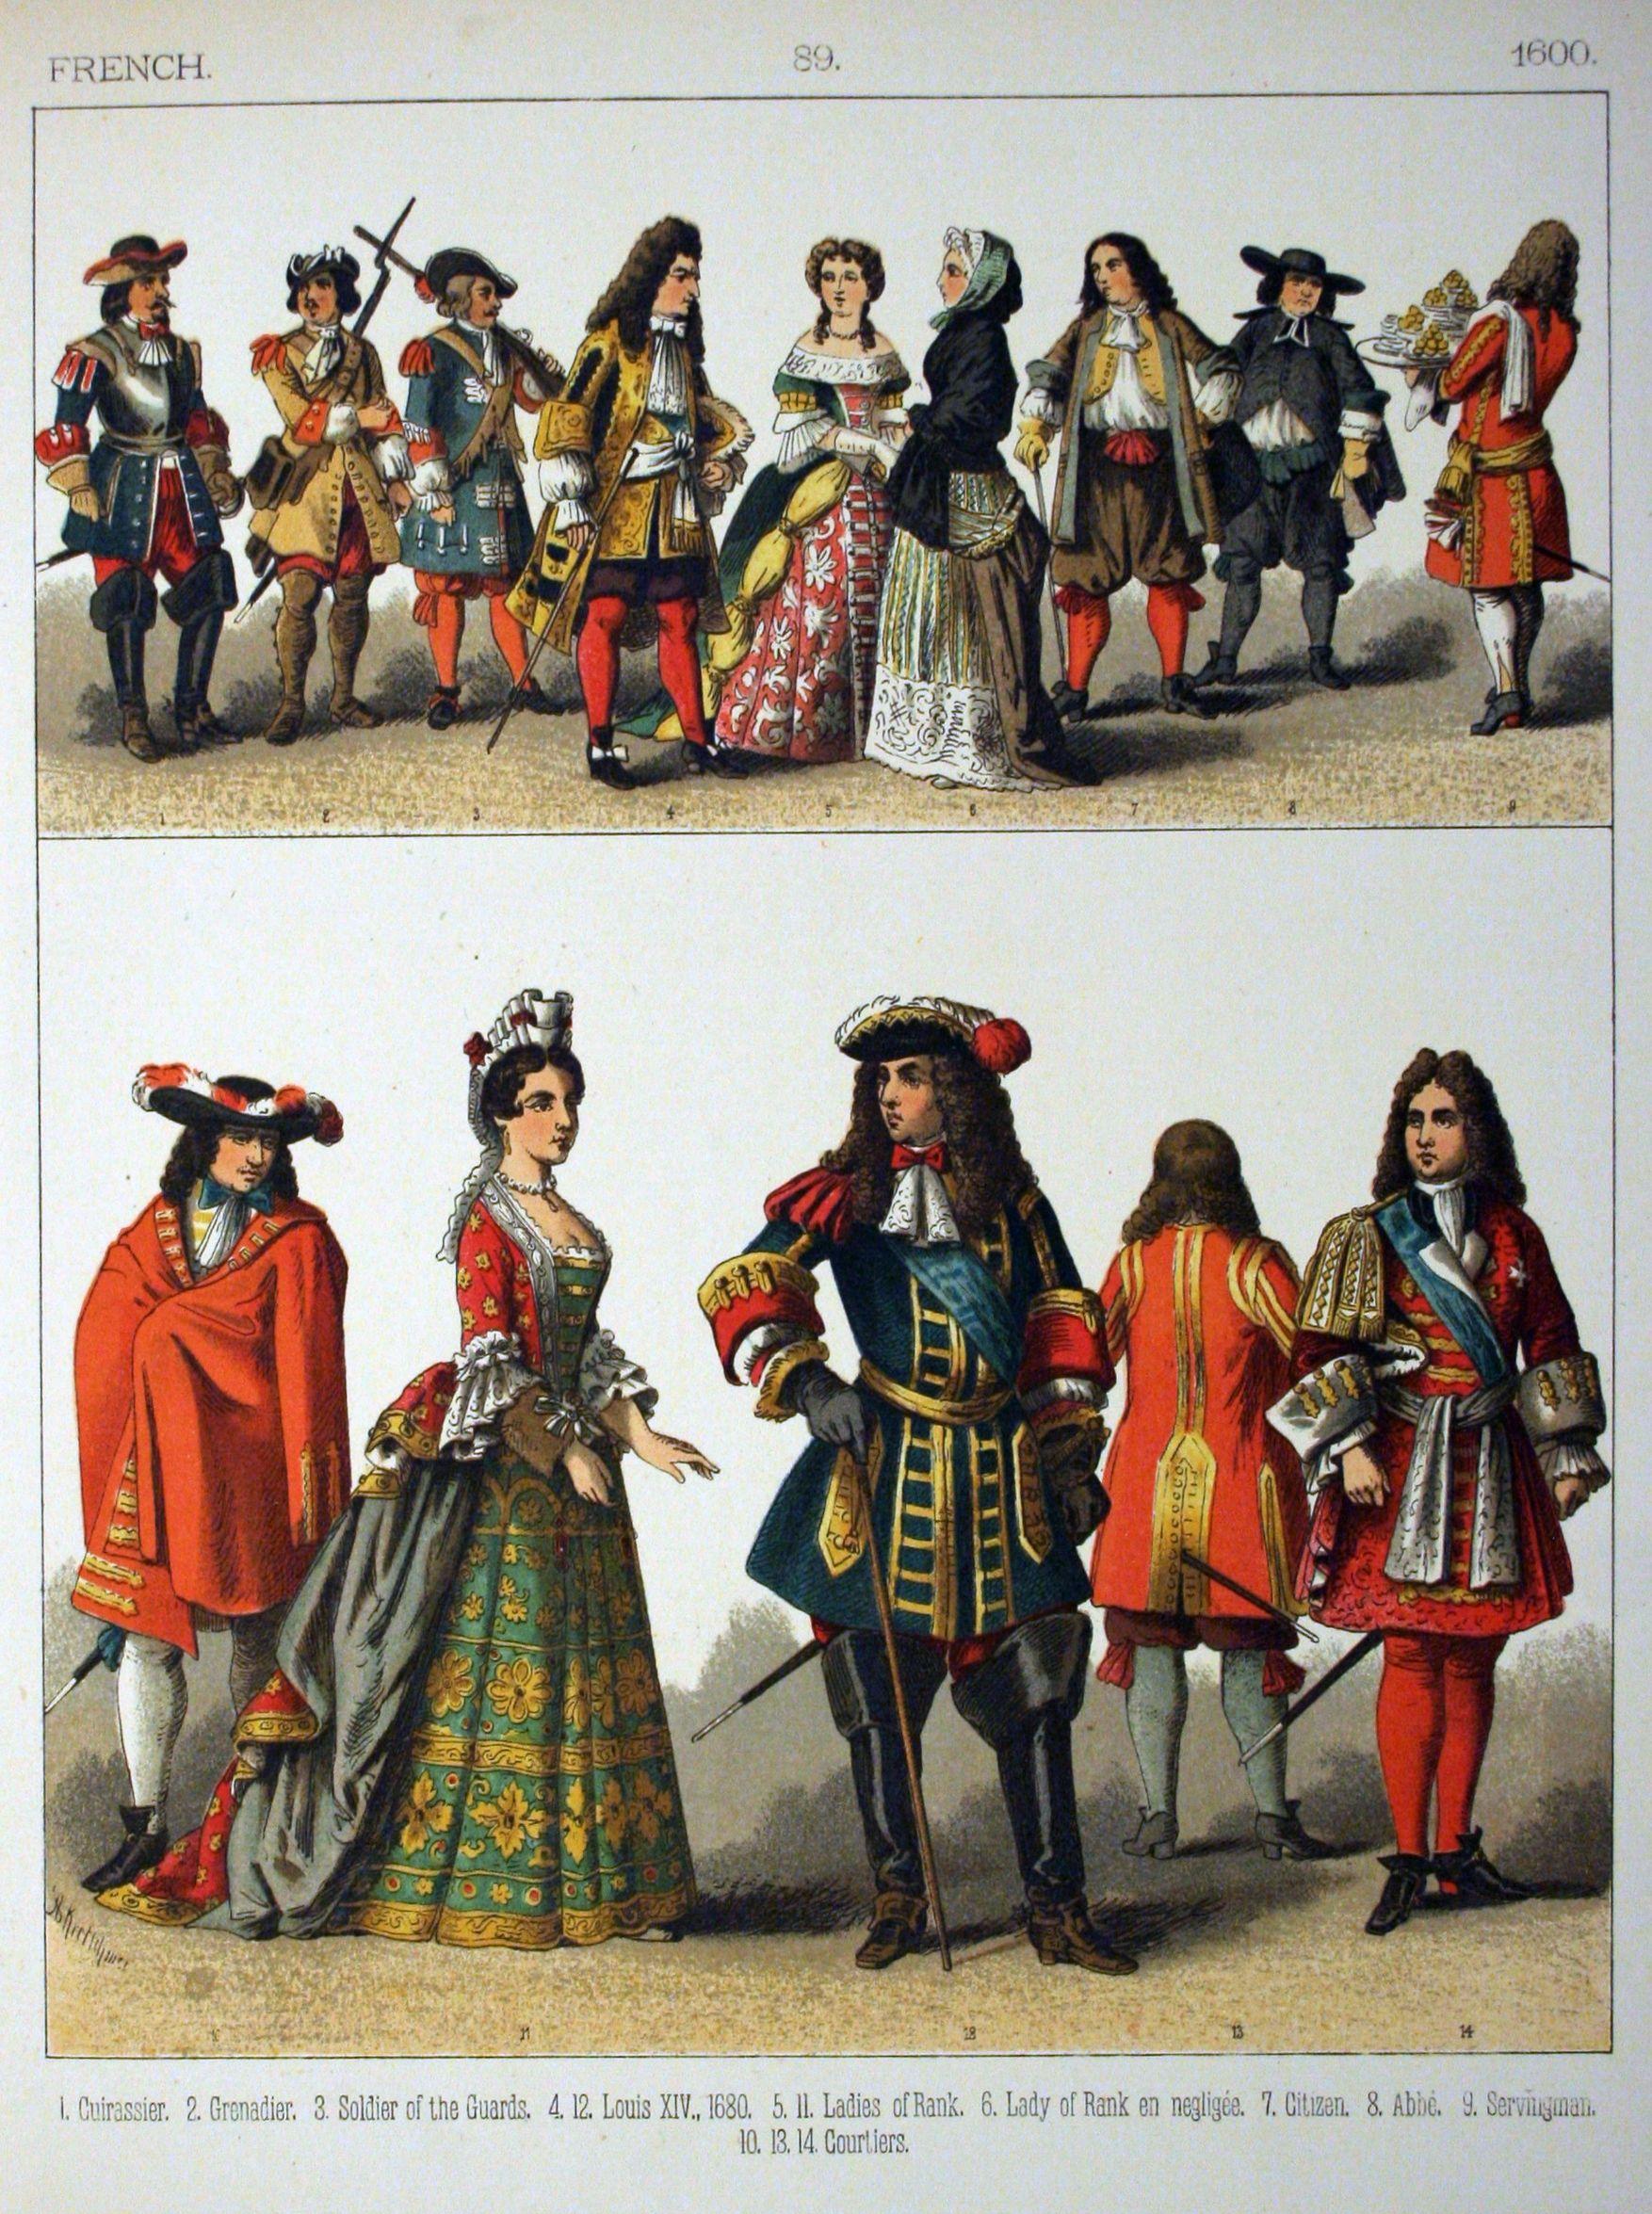 1670 - French fashion